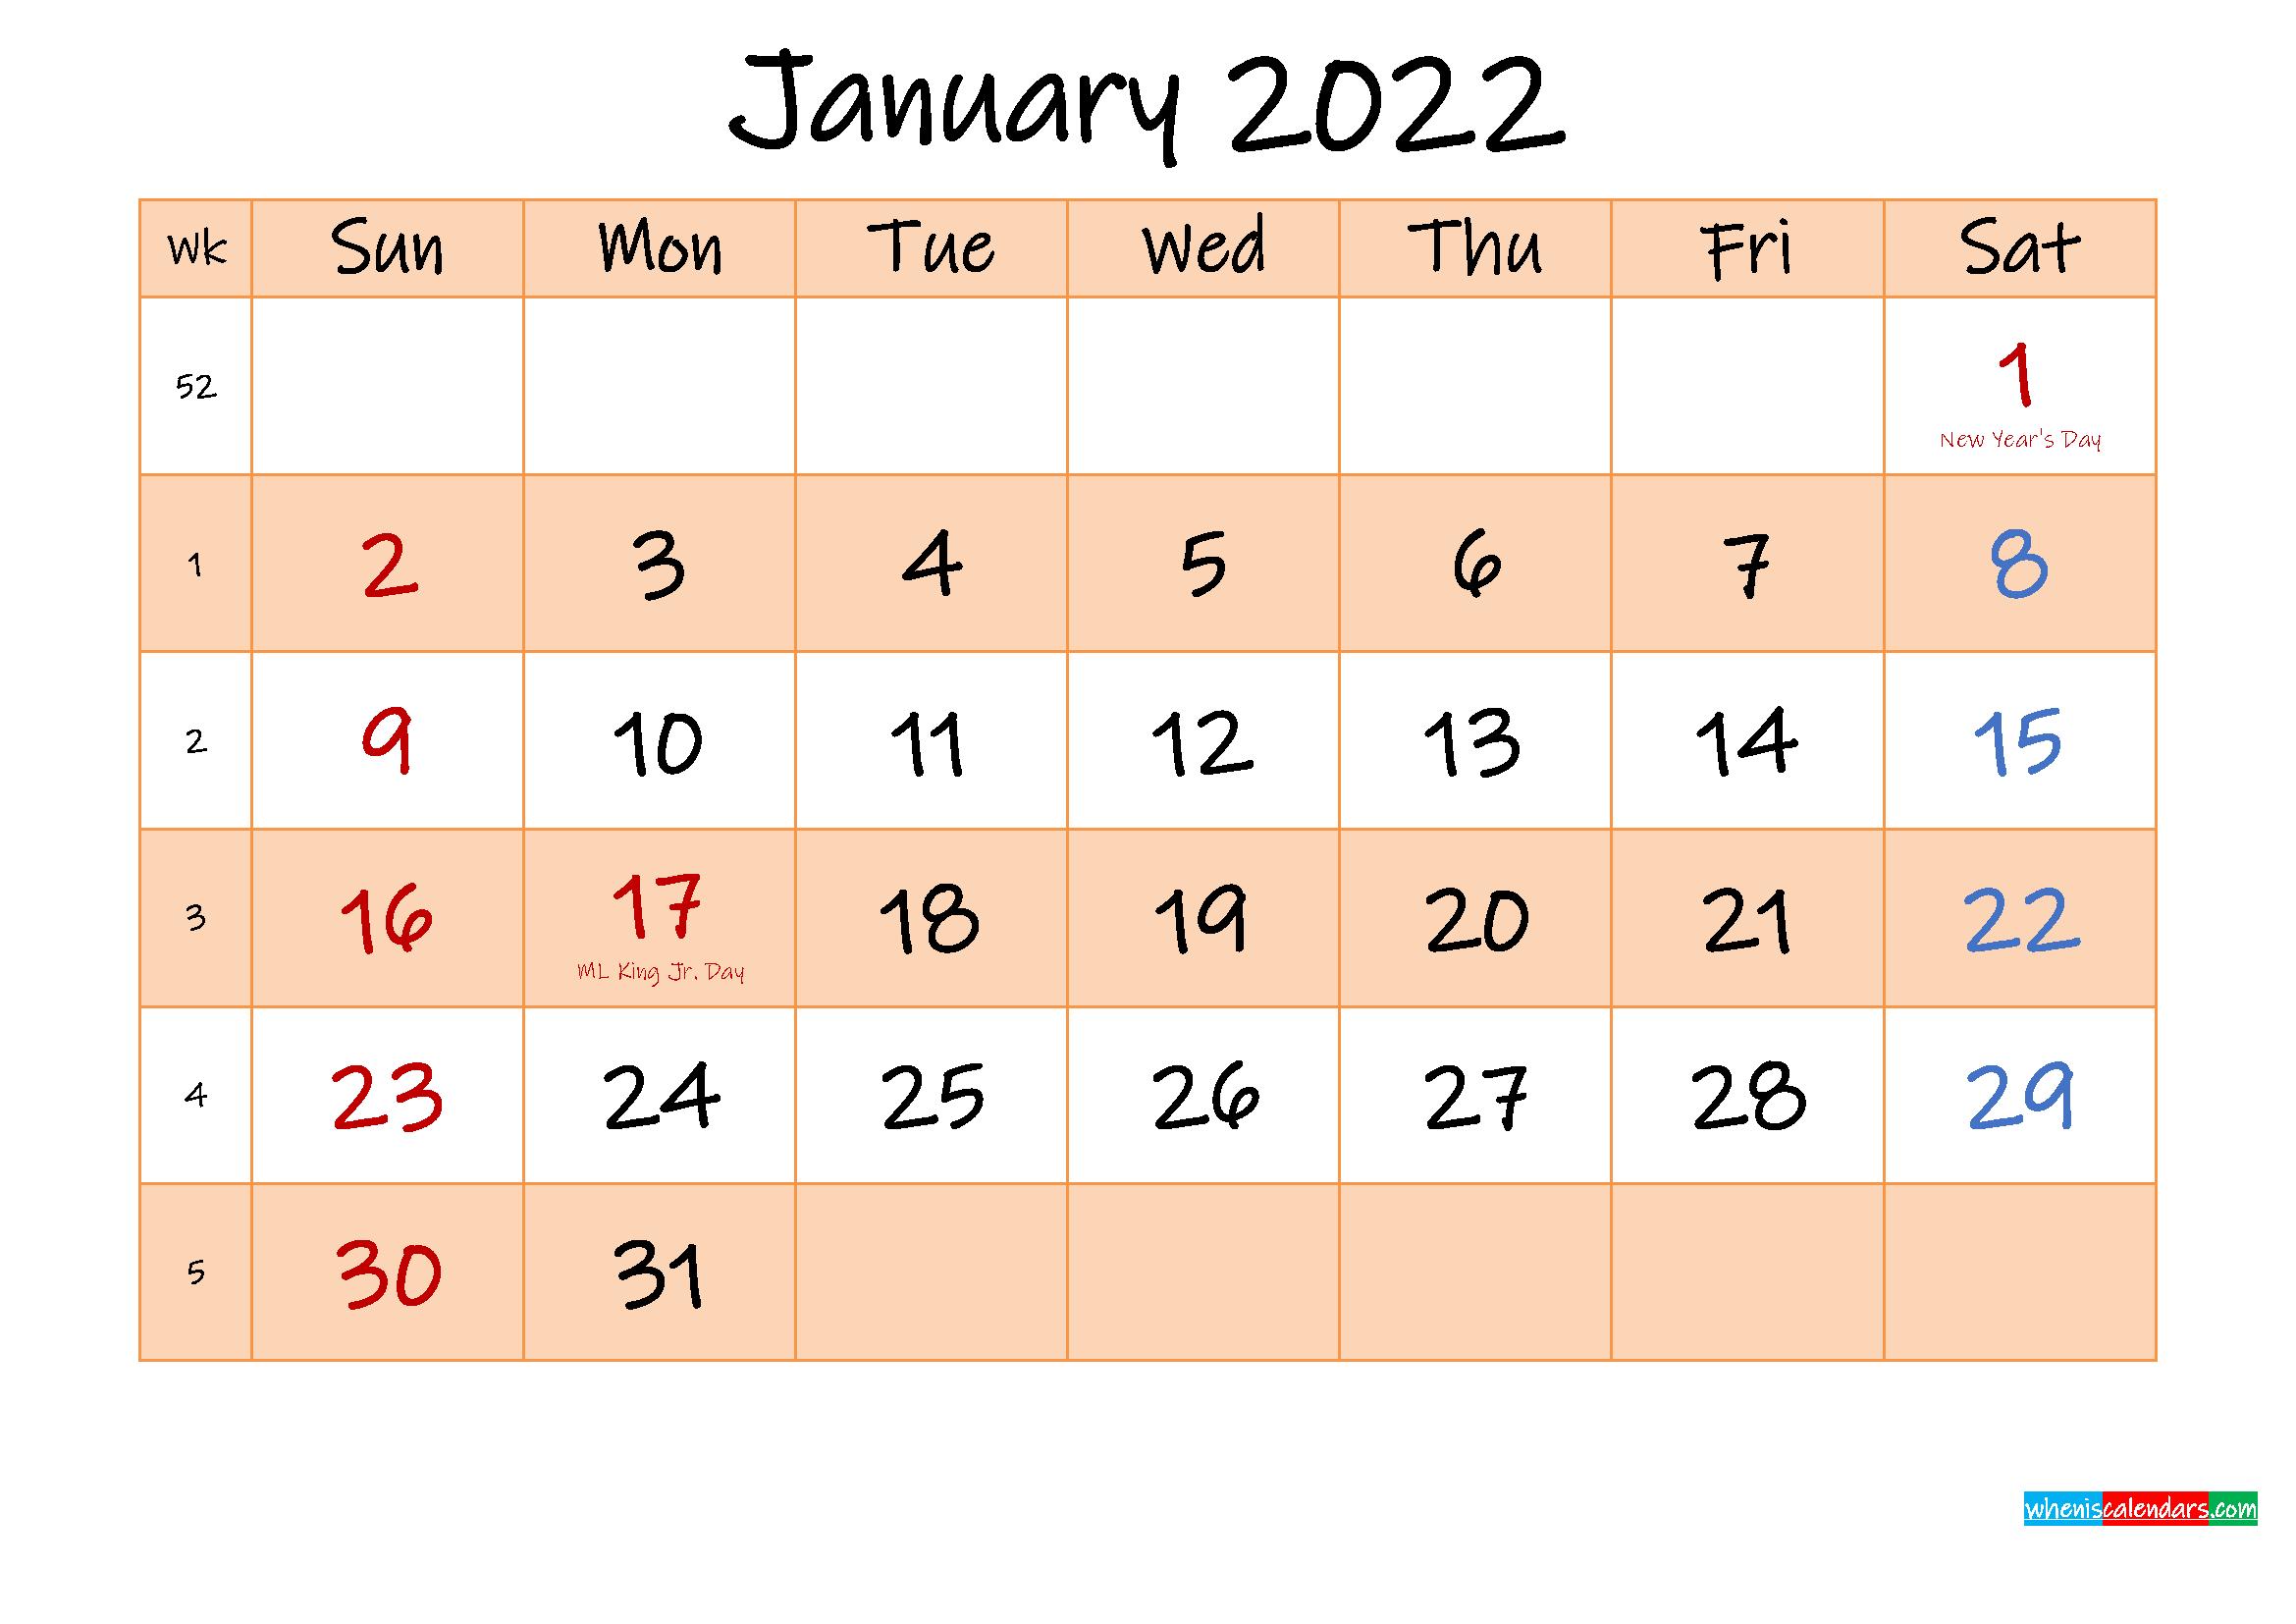 Editable January 2022 Calendar - Template No.ink22M481 in January 2022 Calendar With Julian Dates